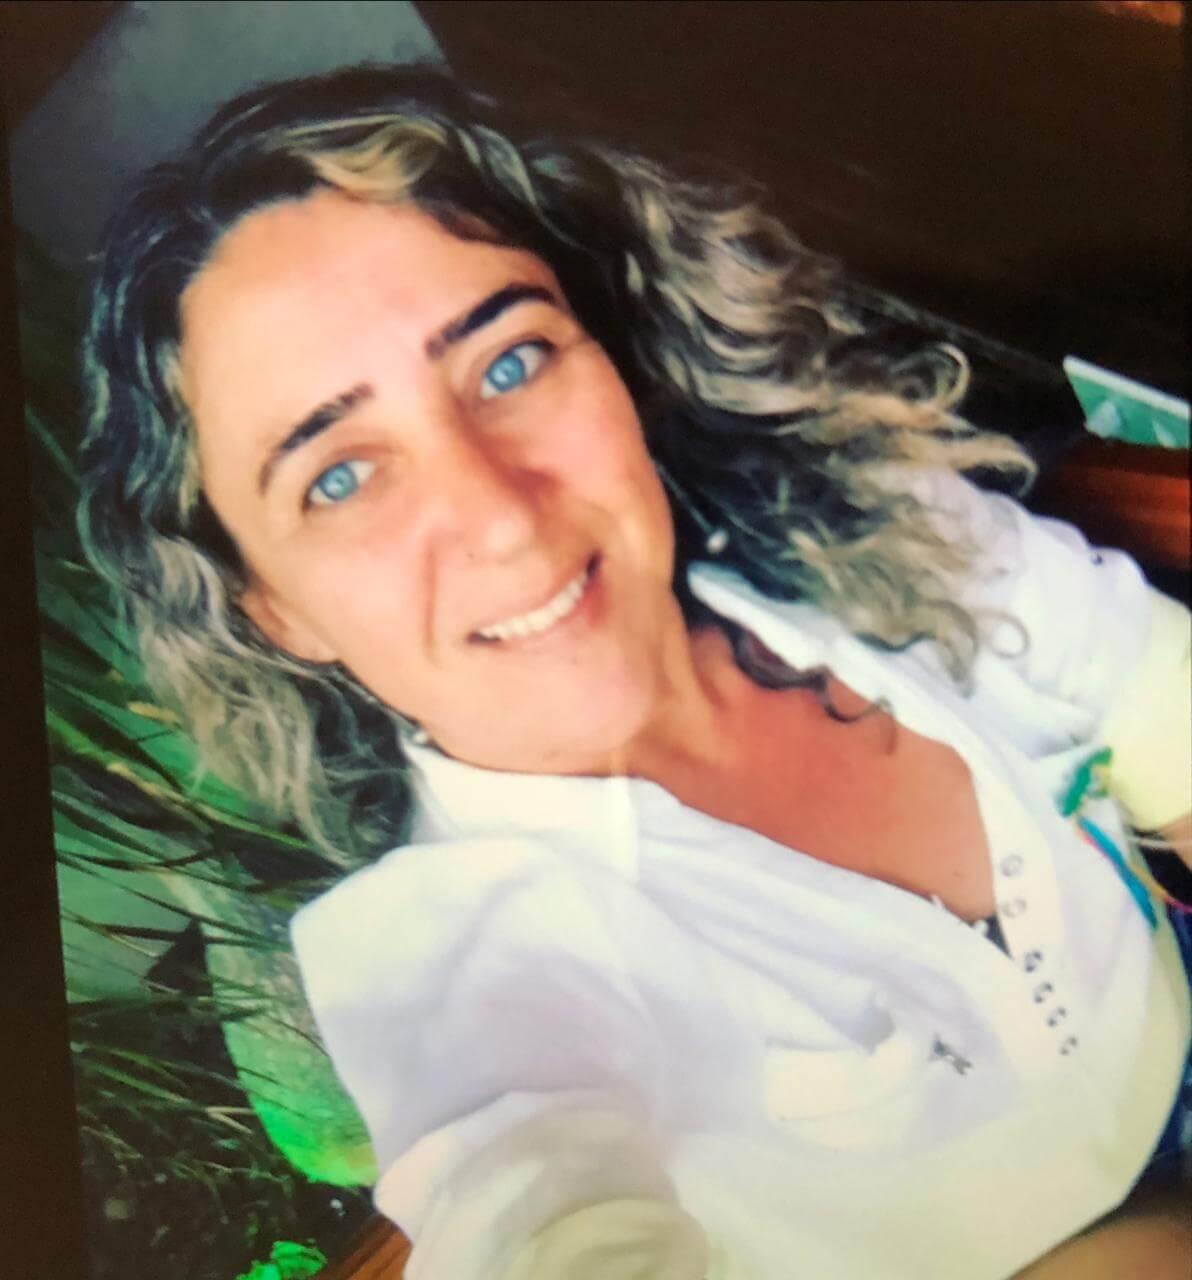 Cristine Souza de Oliveira Meneses